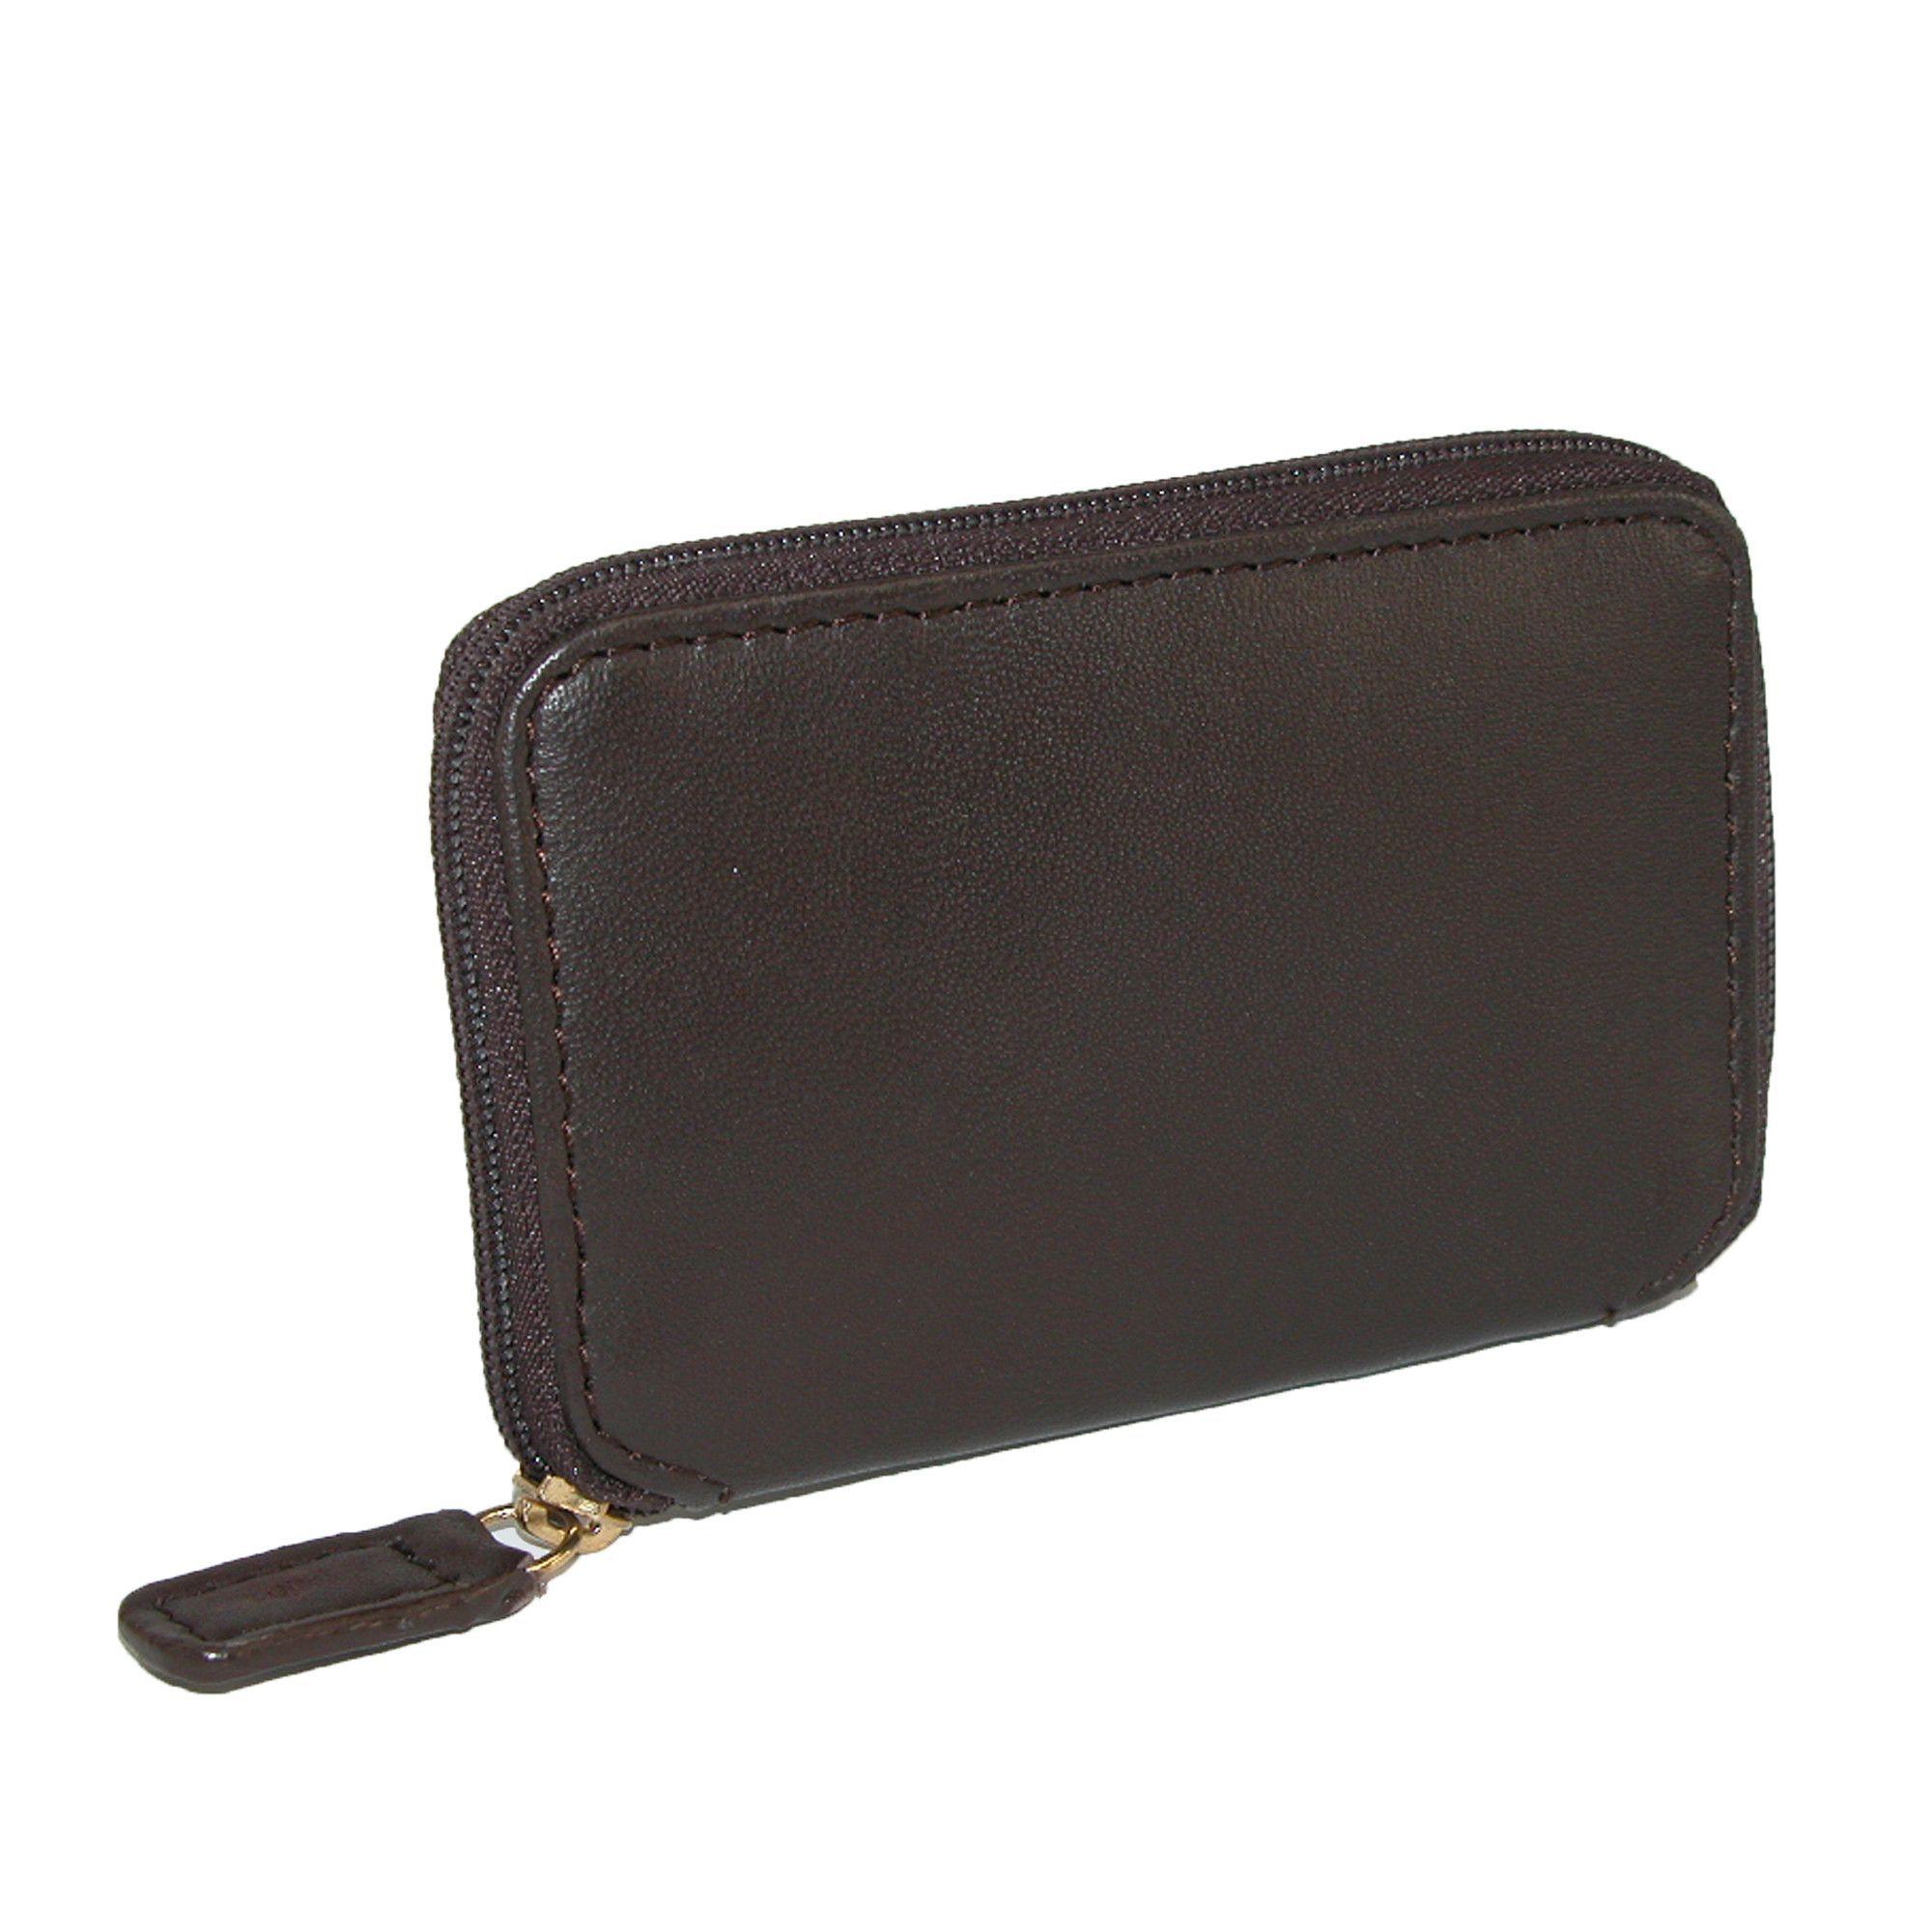 Winn International Mens Leather Zip Around Key Case